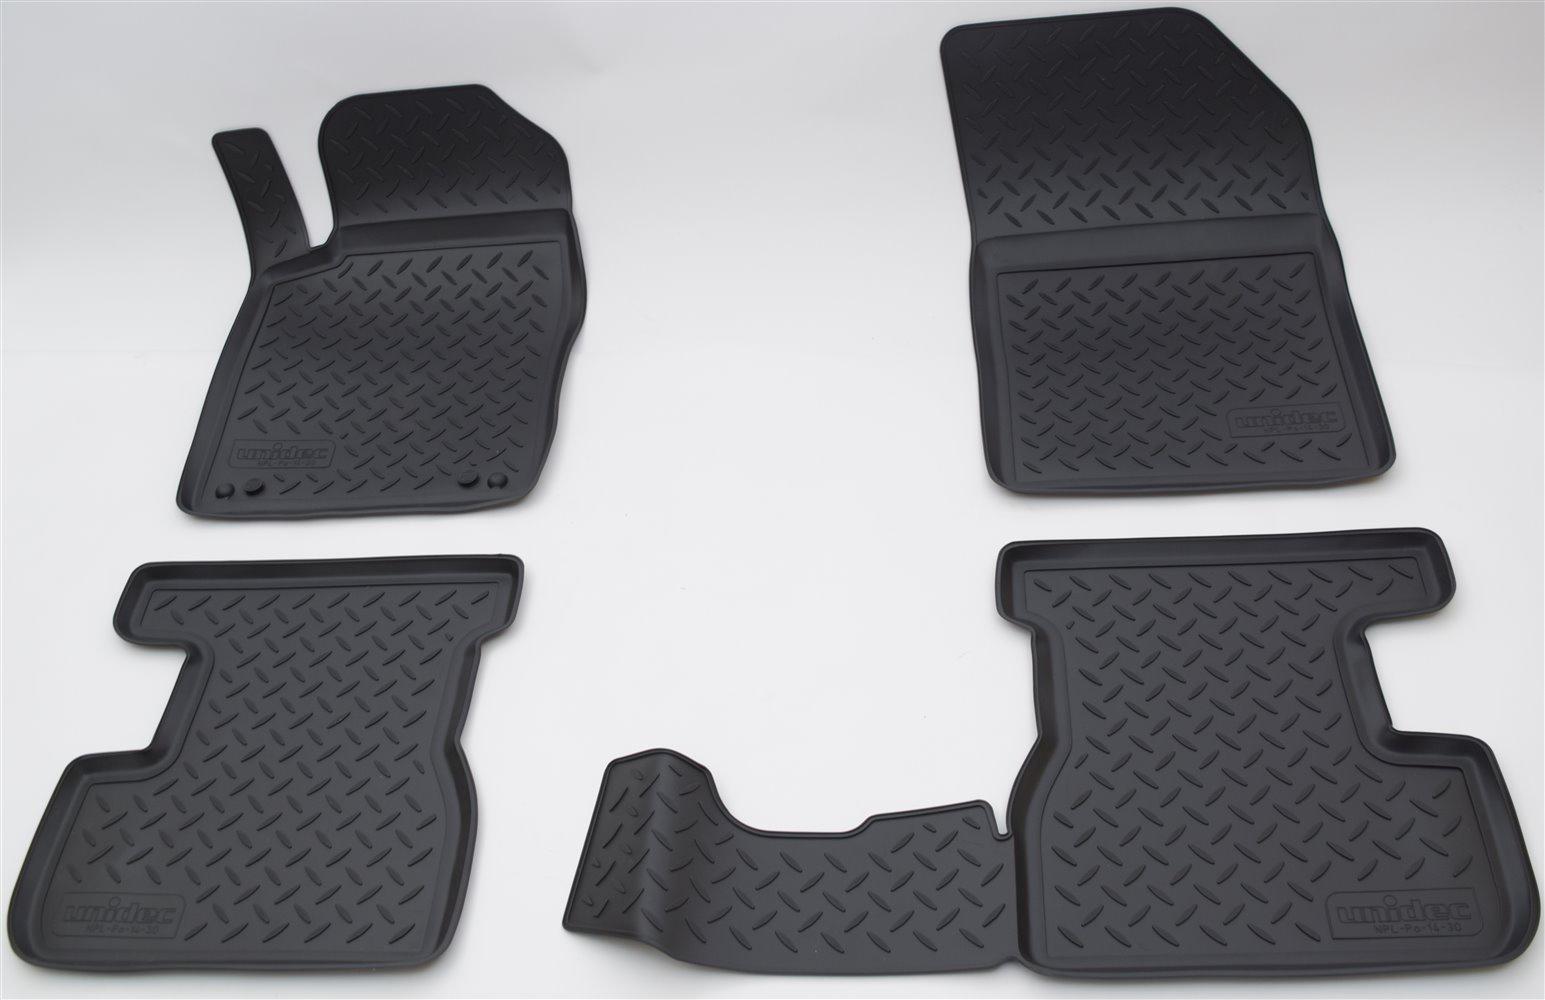 Коврики в салон Norplast для Citroen DS3 S 2010, NPL-Po-14-30, черный цена 2017